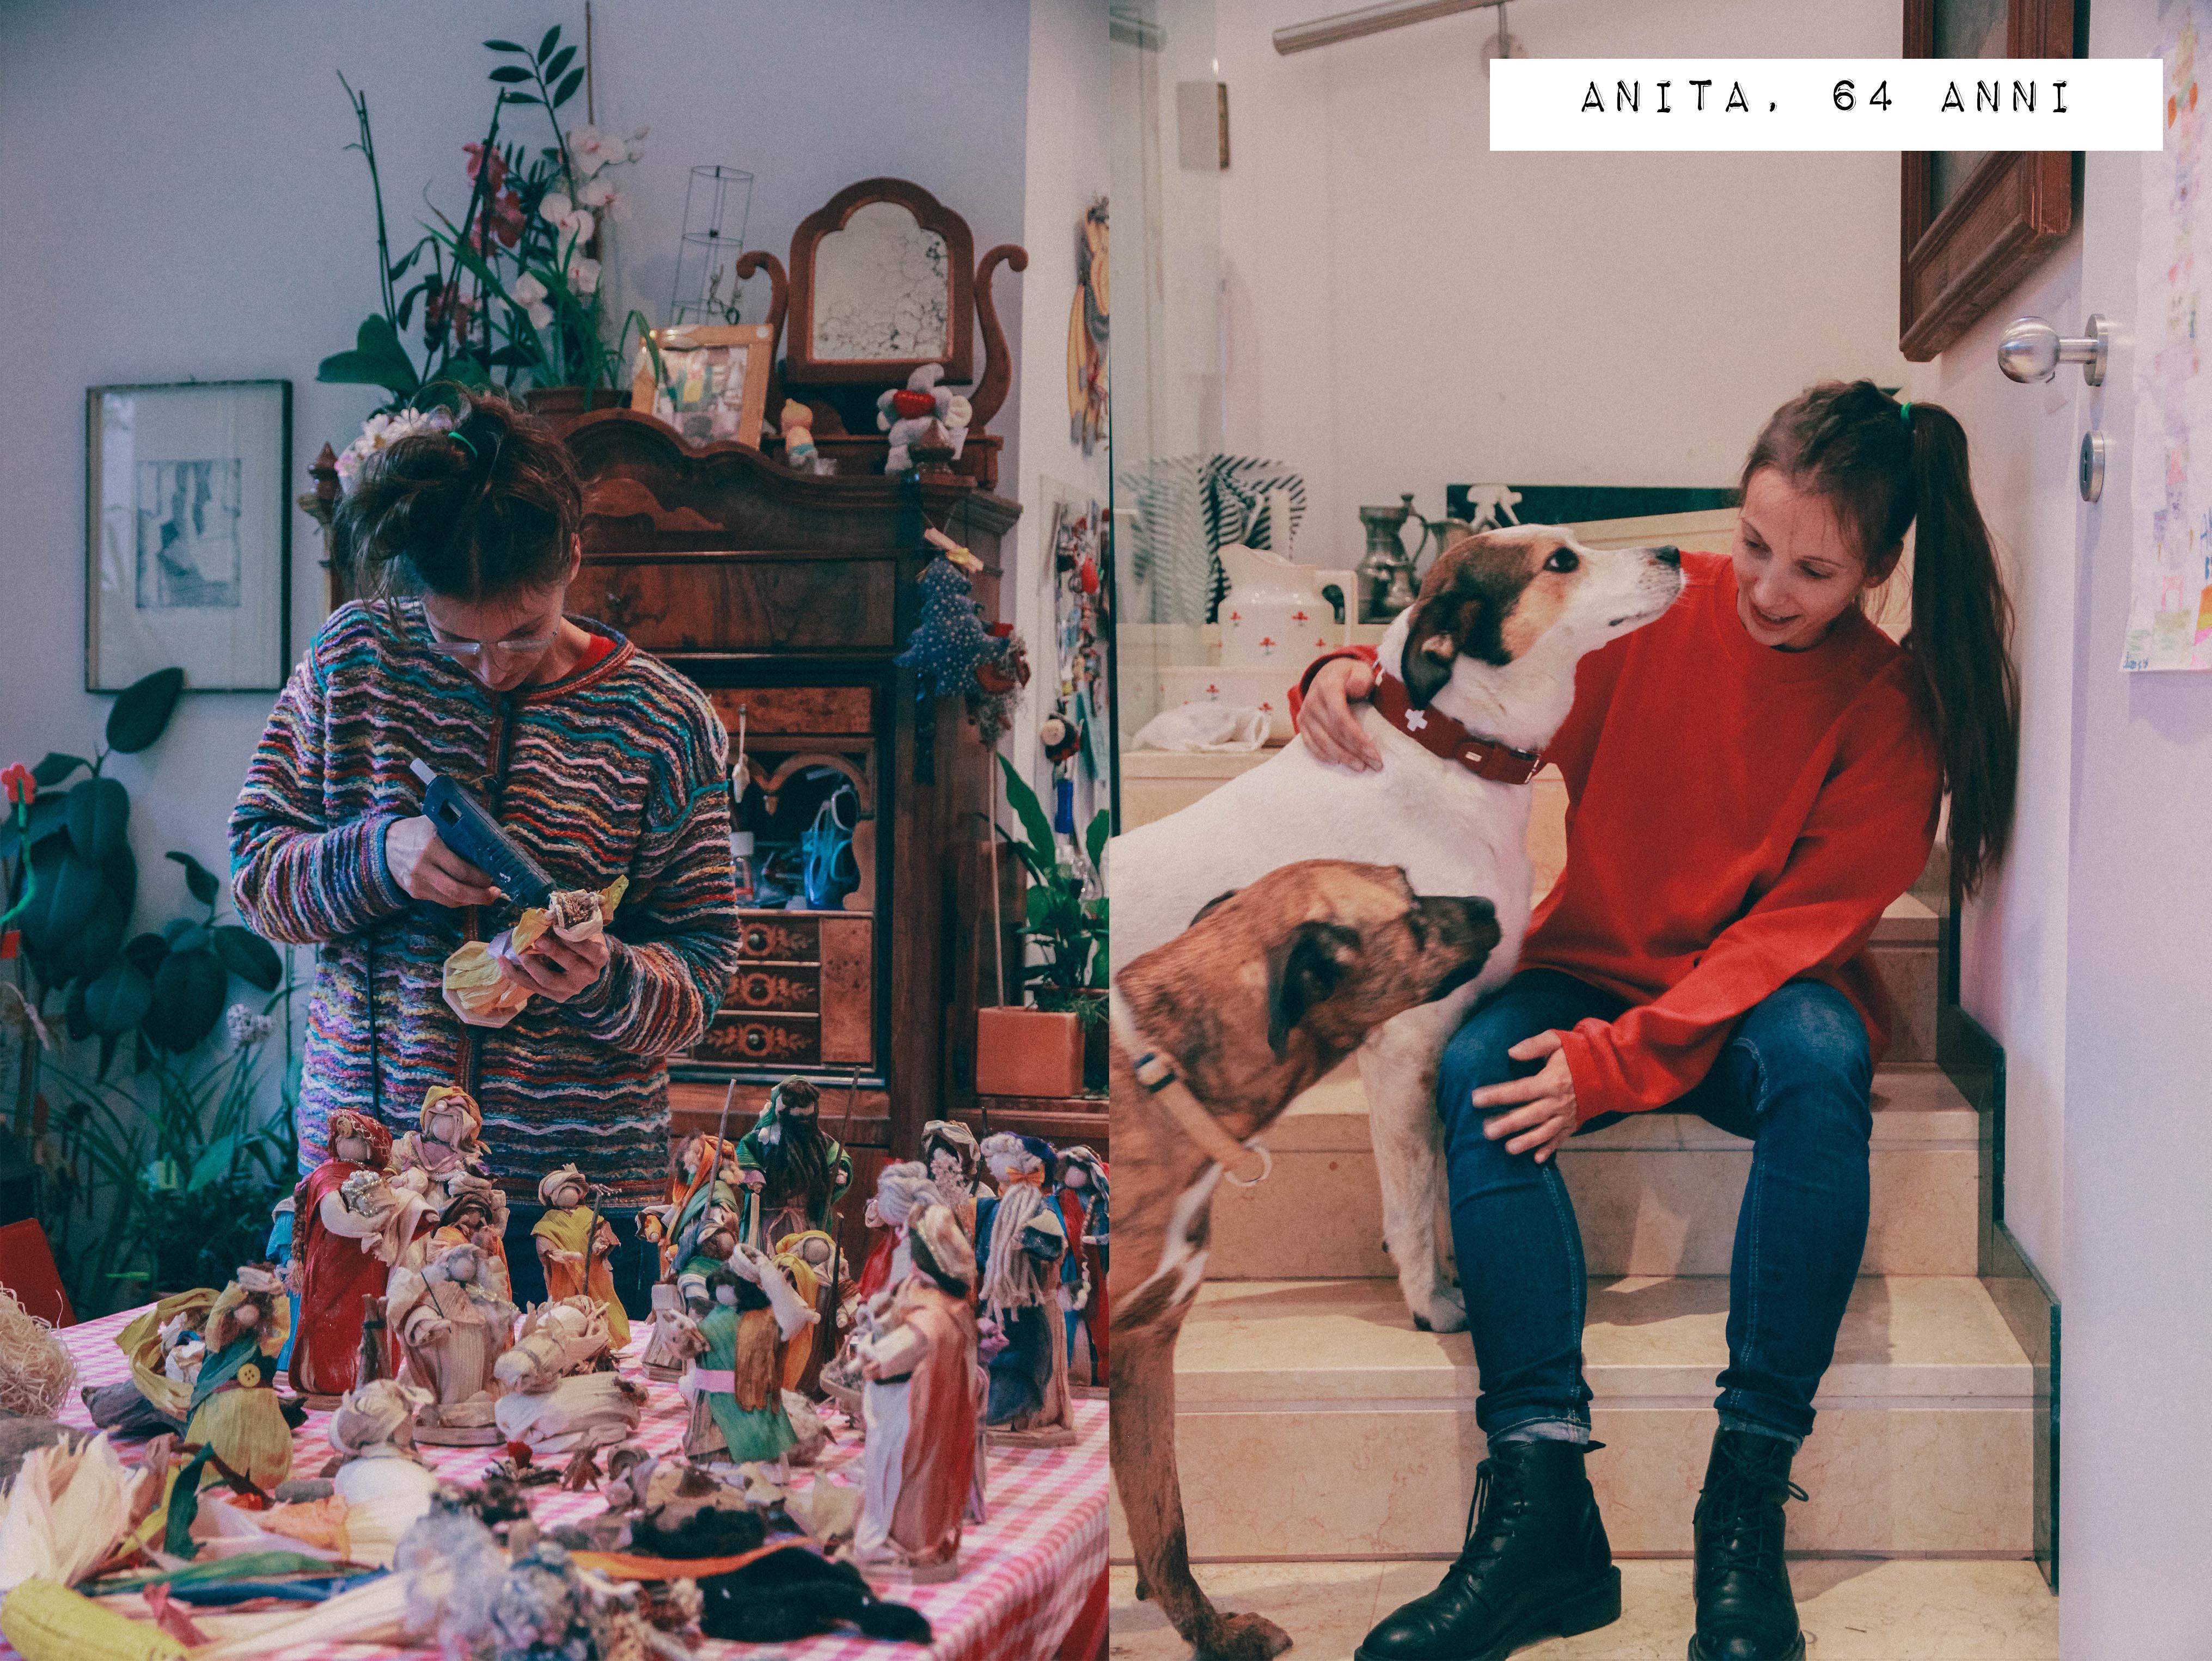 Anita, 64 anni